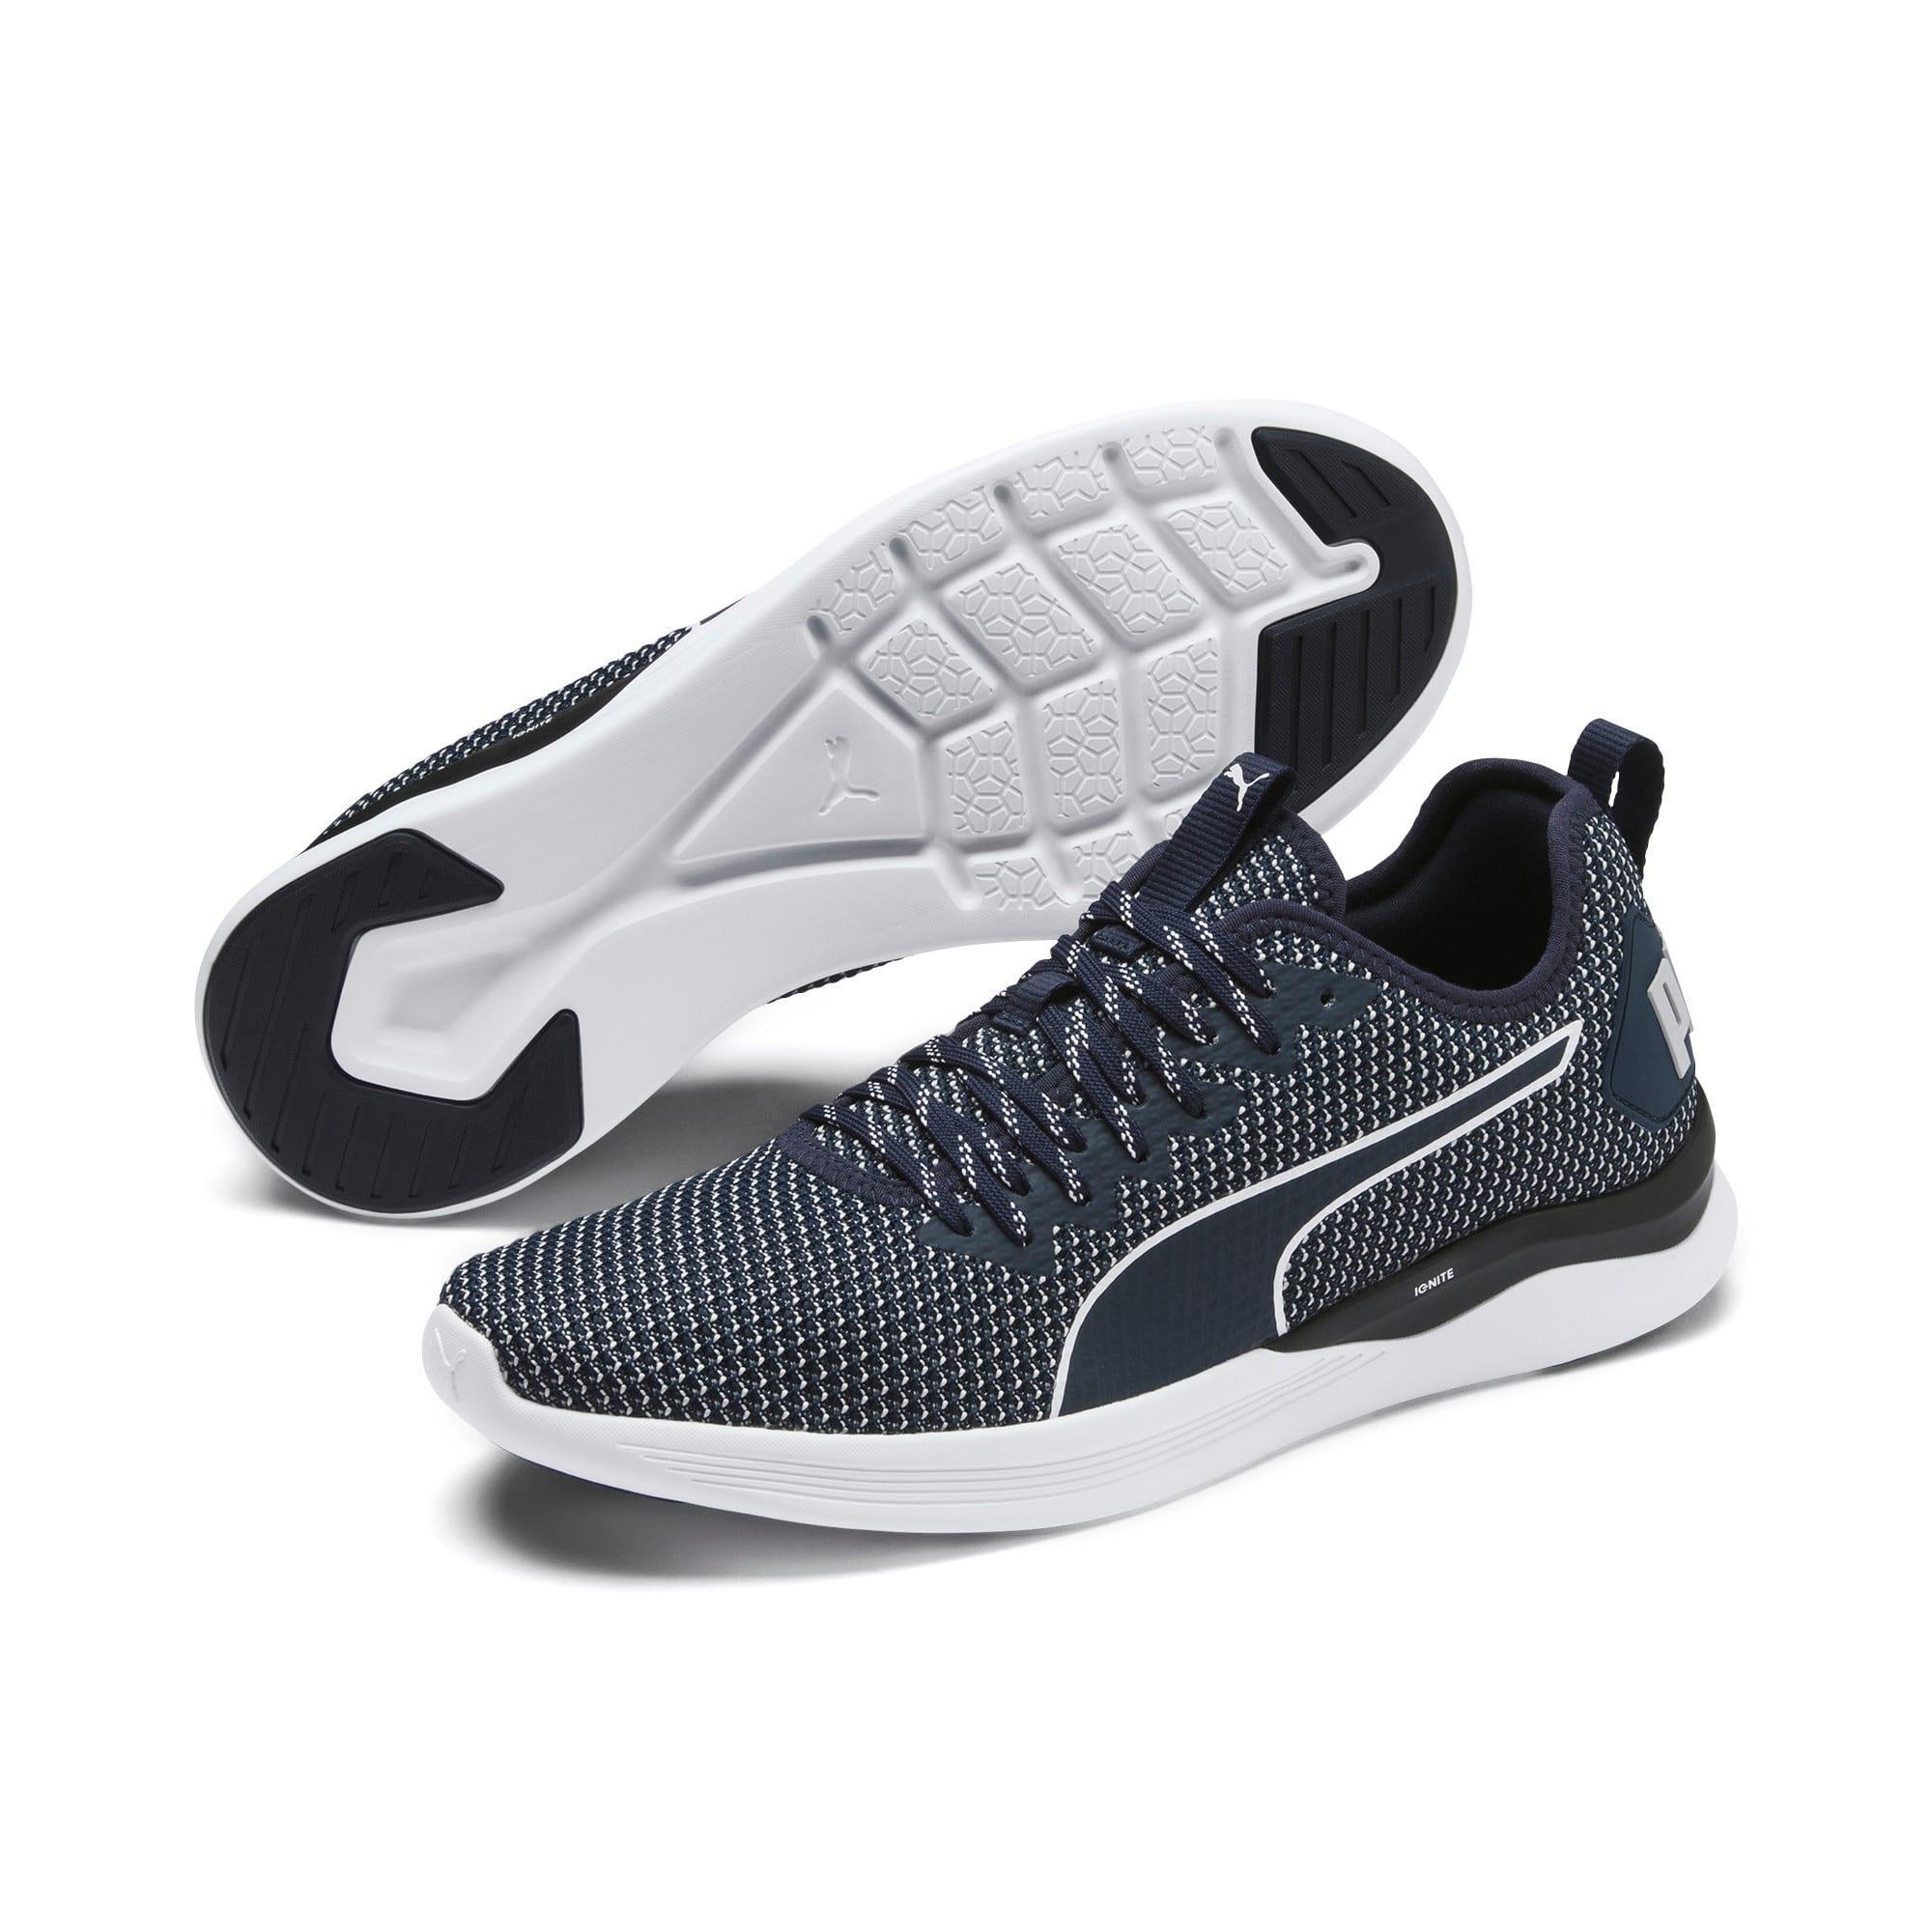 Thumbnail 5 of IGNITE Flash FS Men's Running Shoes, Peacoat-Glacier Gray-White, medium-IND